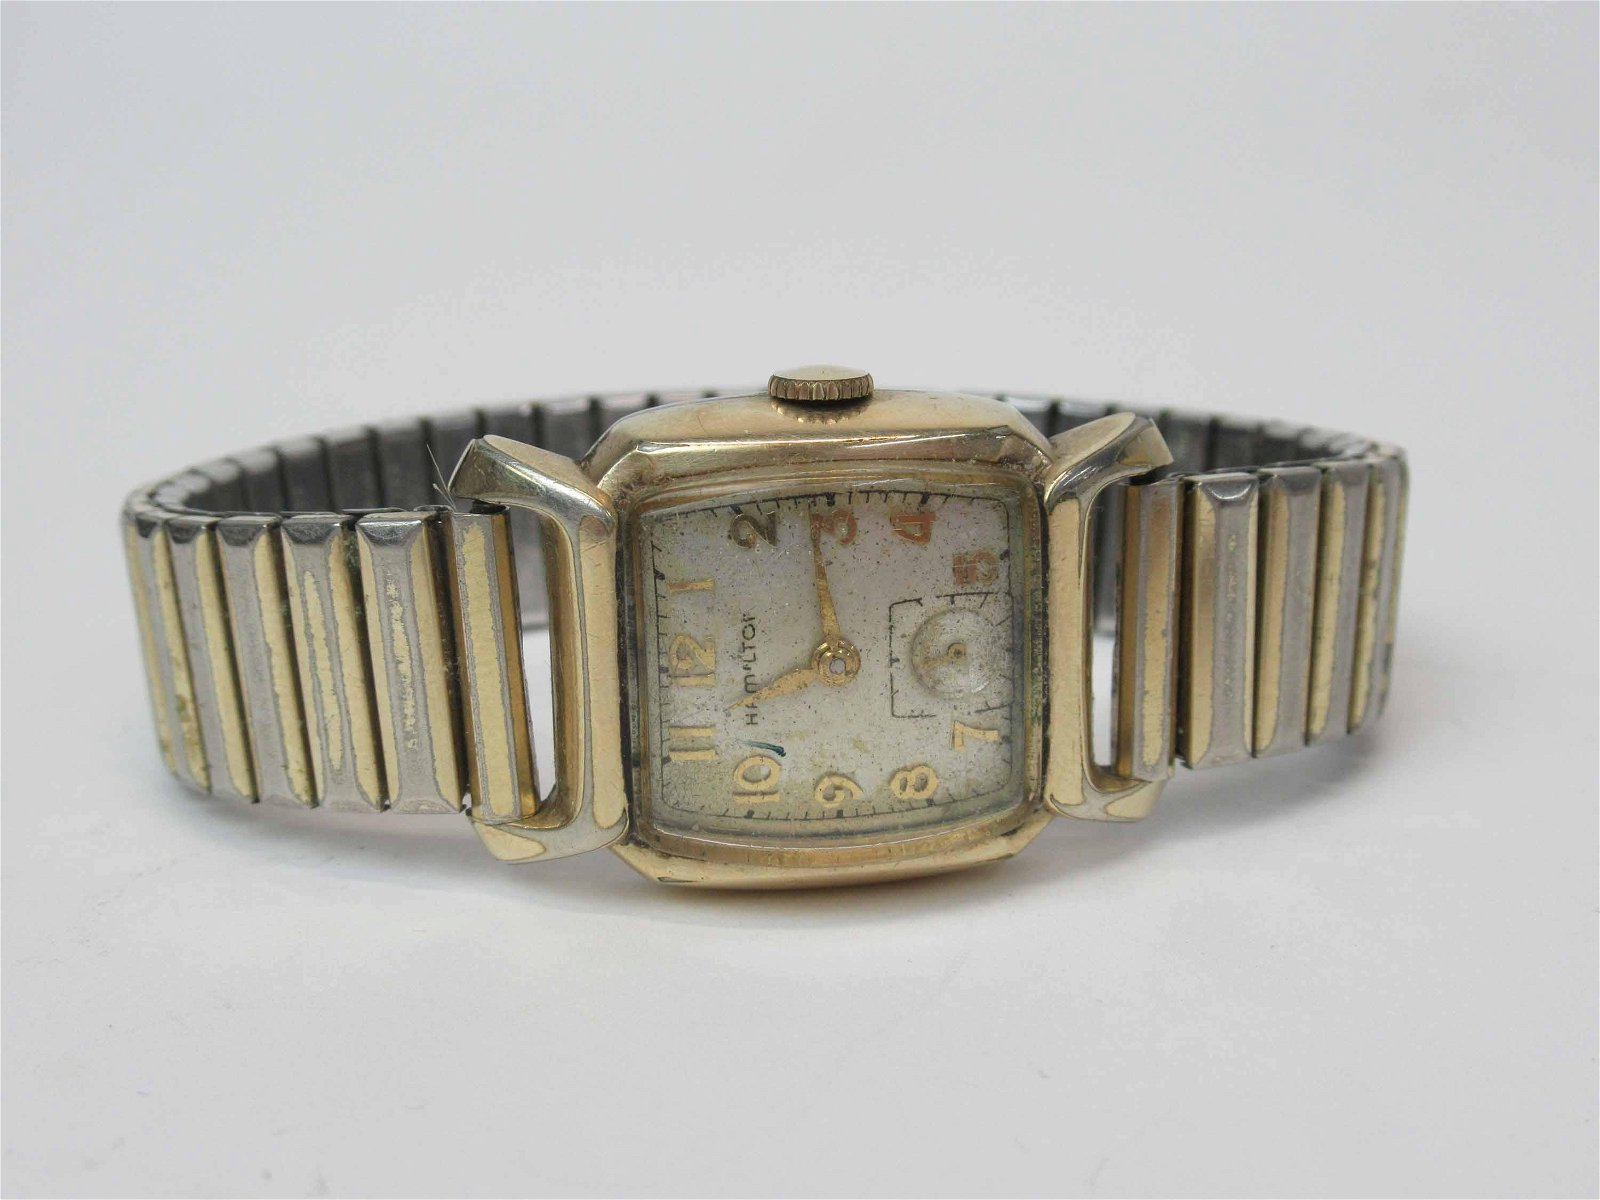 Vintage Hamilton 10K Gold Filled Wrist Watch